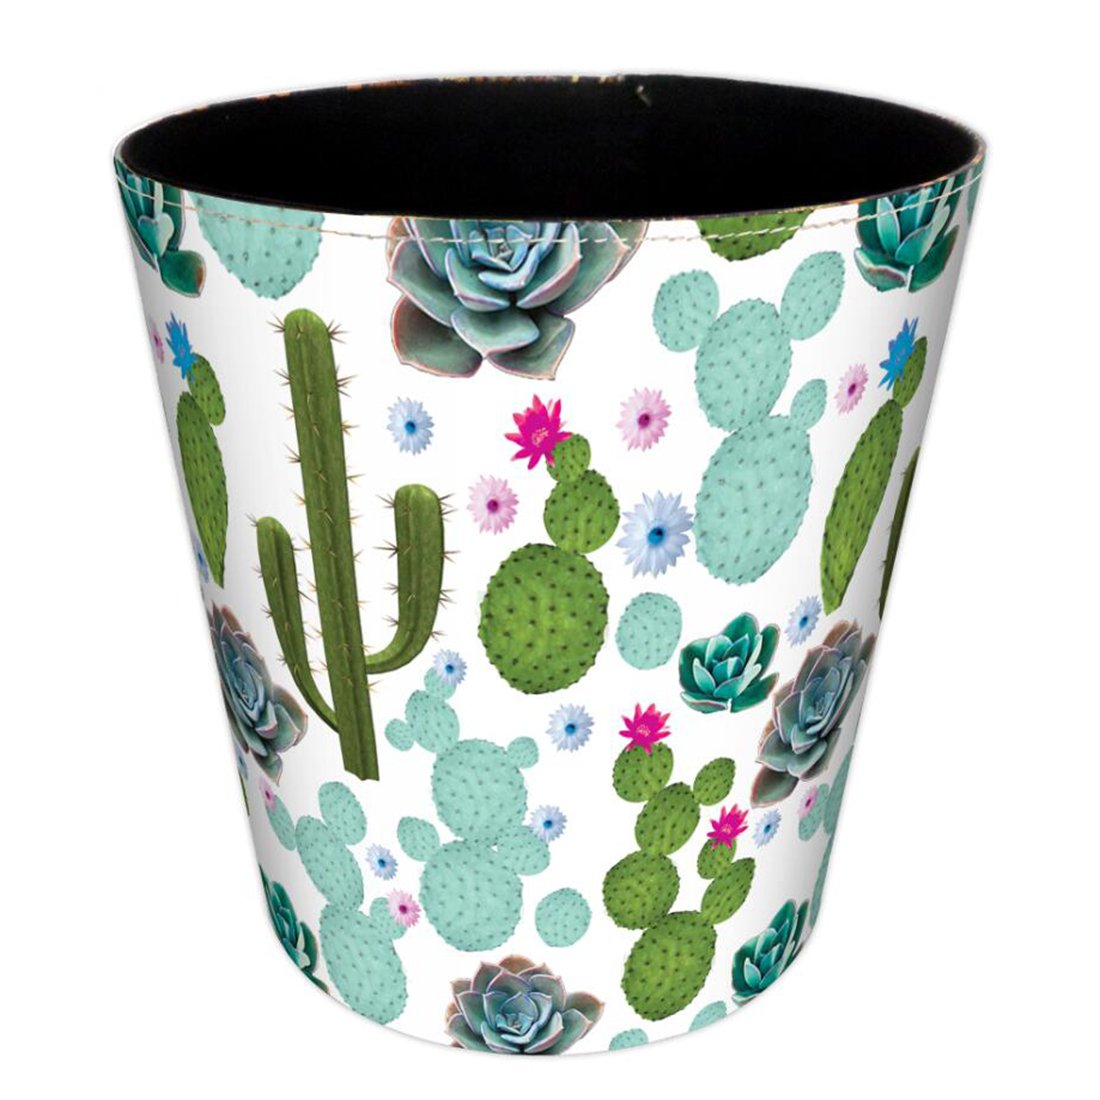 Wastebasket, Hamne 7.48x7.48x7.48Inch British Style Trash Bin Household Uncovered Garbage Can Wastebasket - (Cactus-1 Pattern)